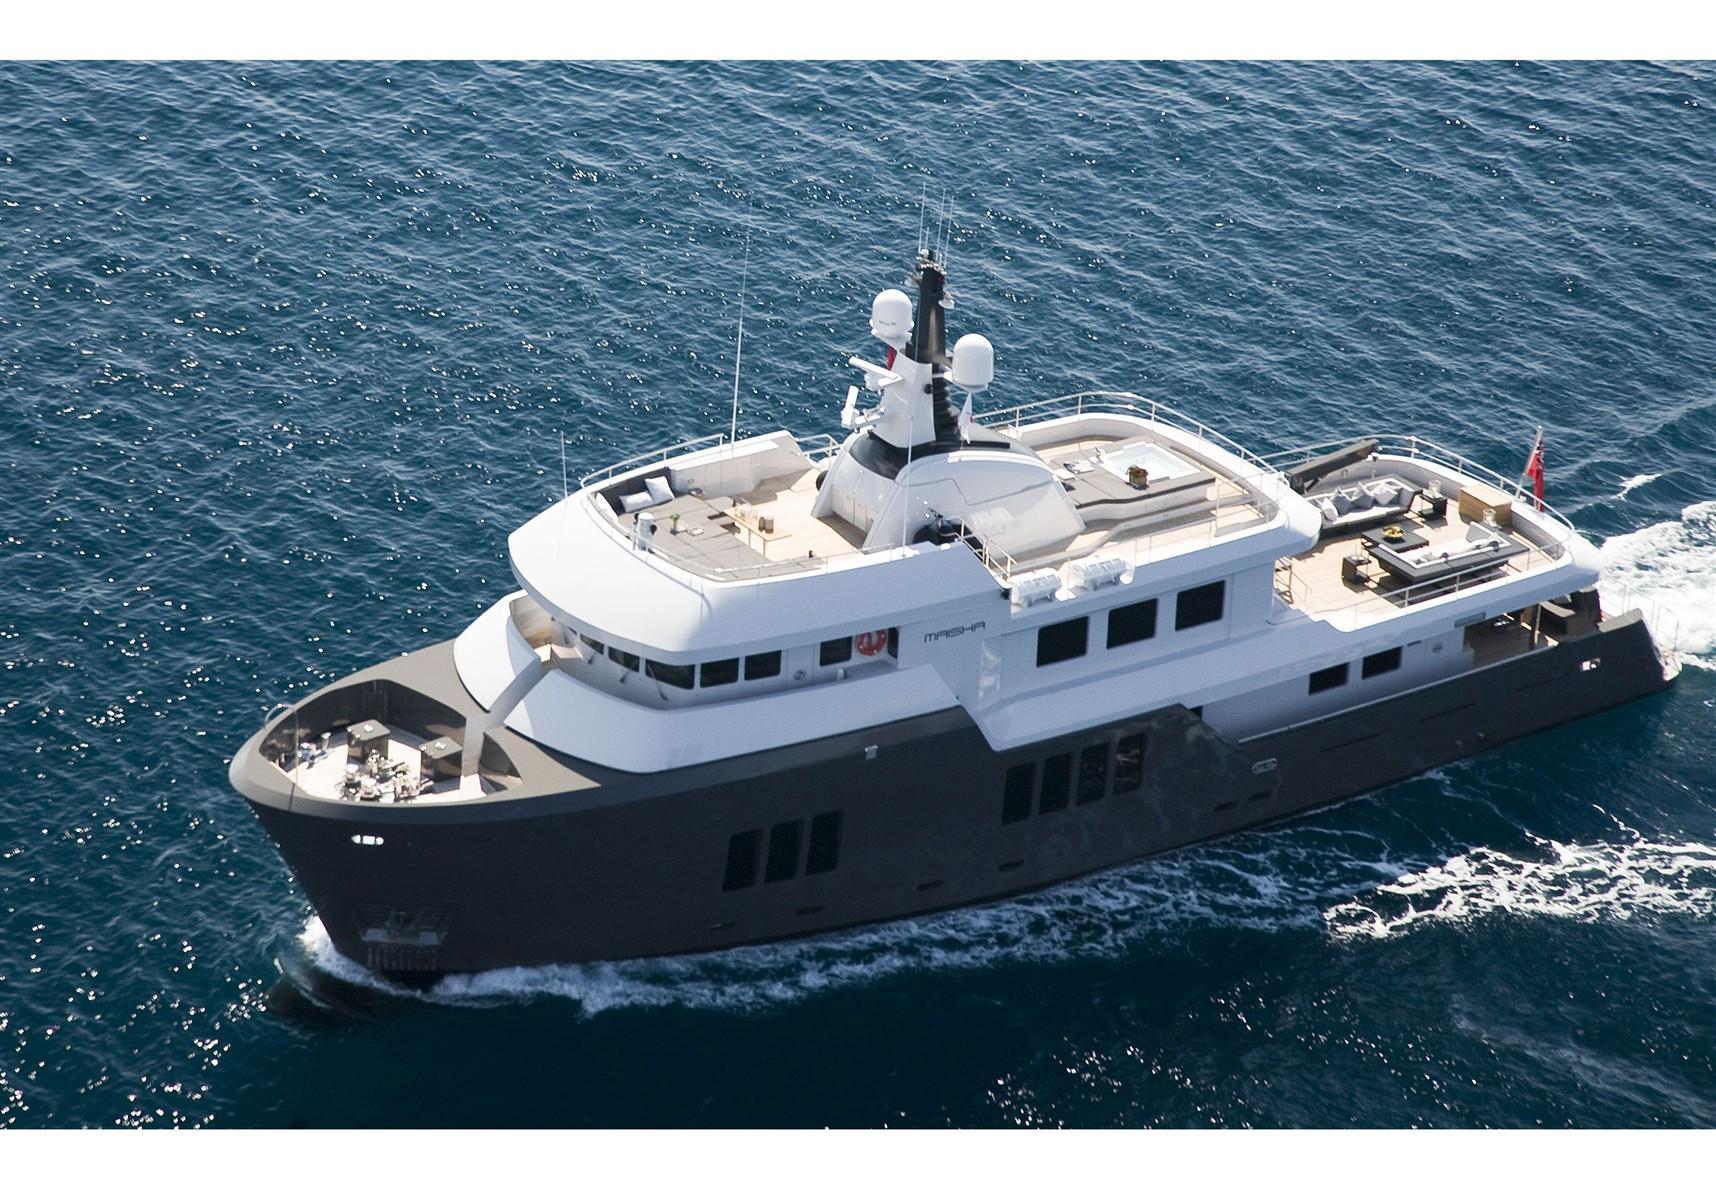 MAISHA - Cobra Expedition Yacht - Profile